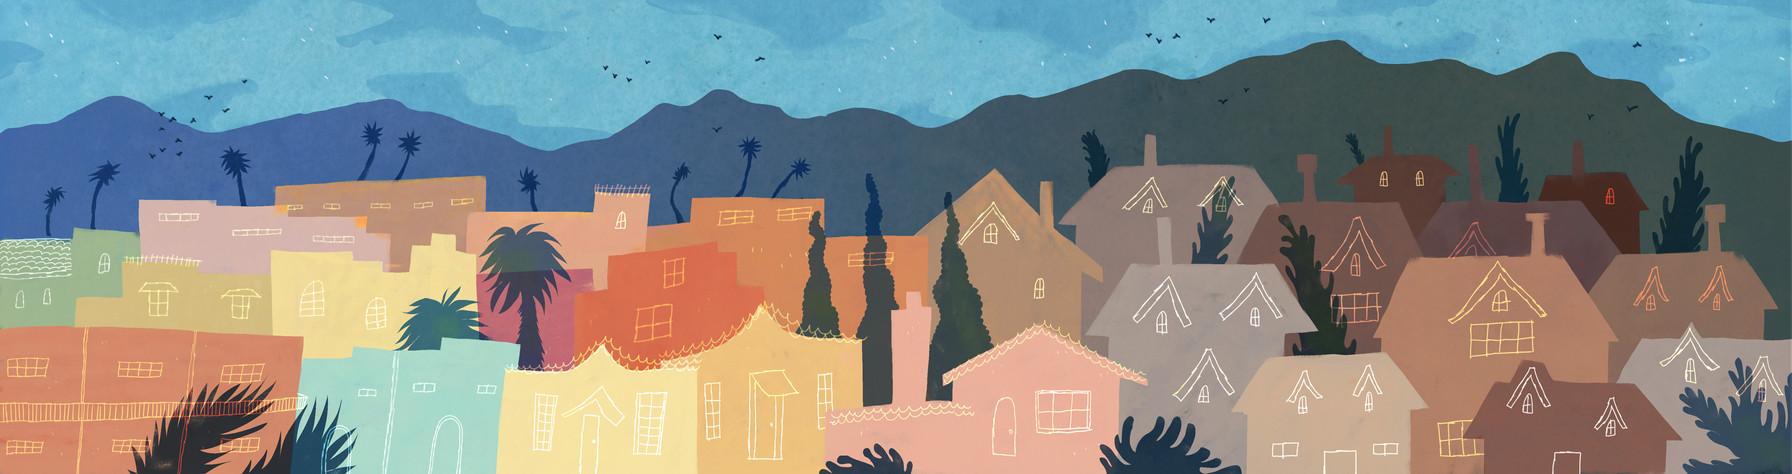 BPR: LA HOUSING ILLUSTRATION